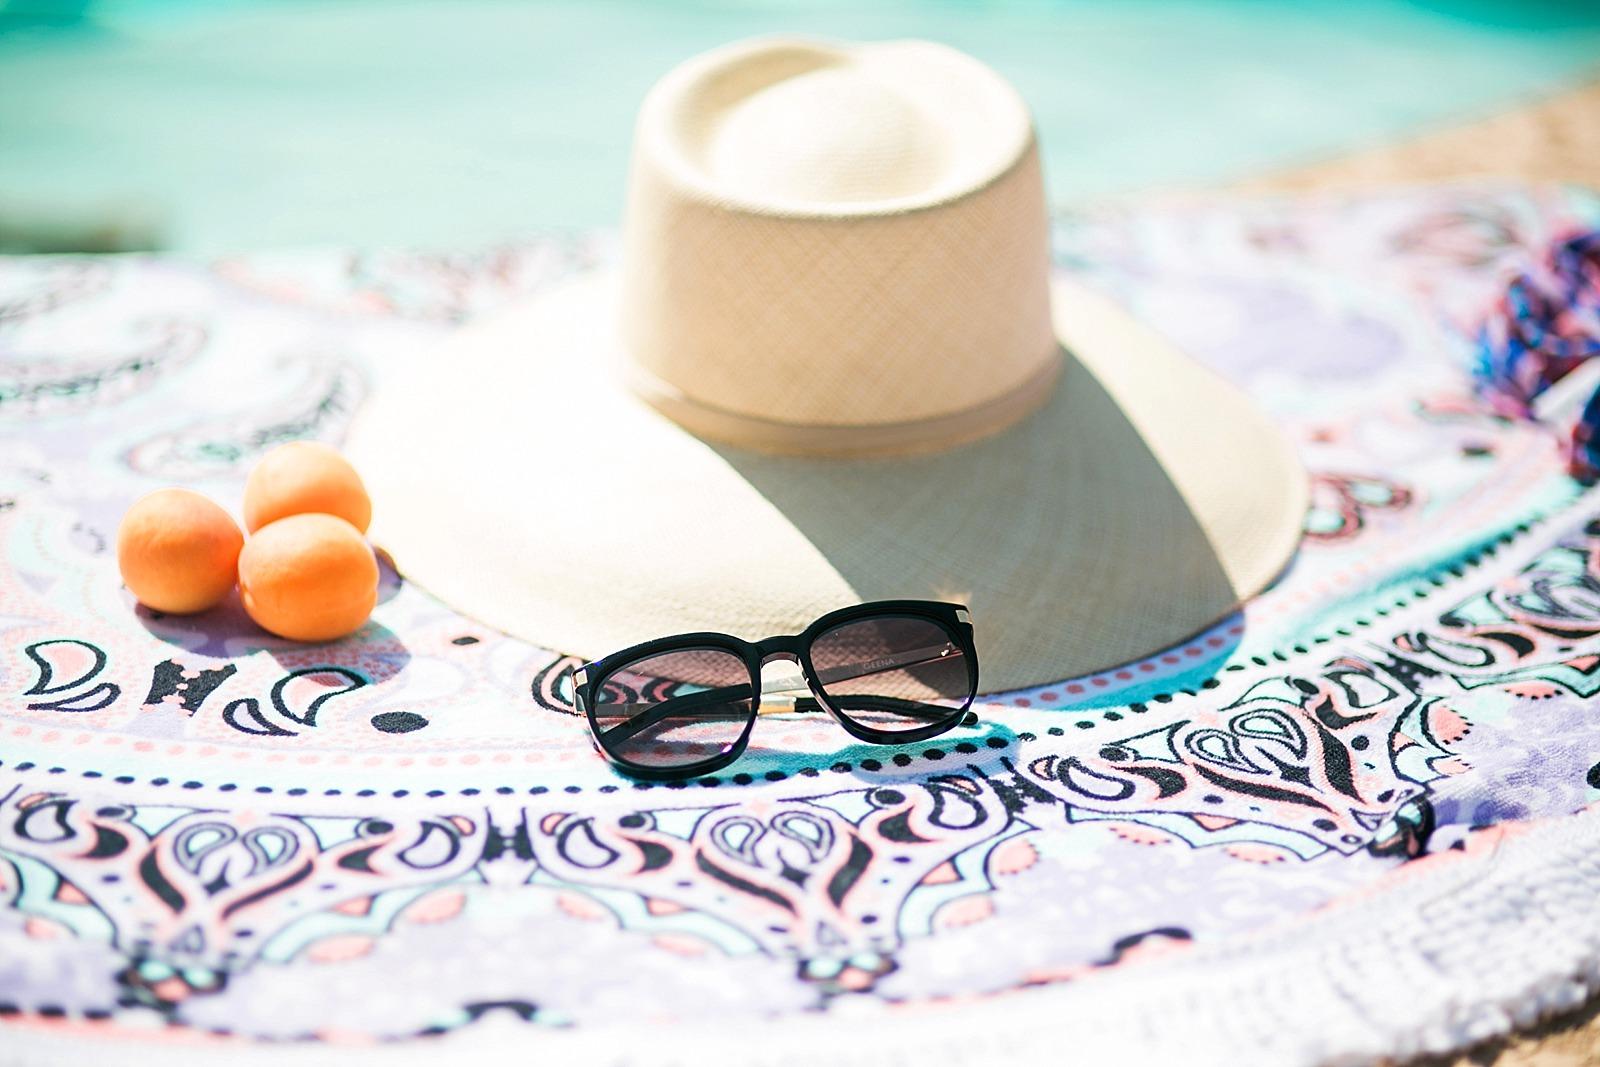 weight-watchers-pool-ready-summer-photoshoot-pool-shoot-model-lifestyle-blogger-arizona-phoenix-diana-elizabeth-blog-_0044